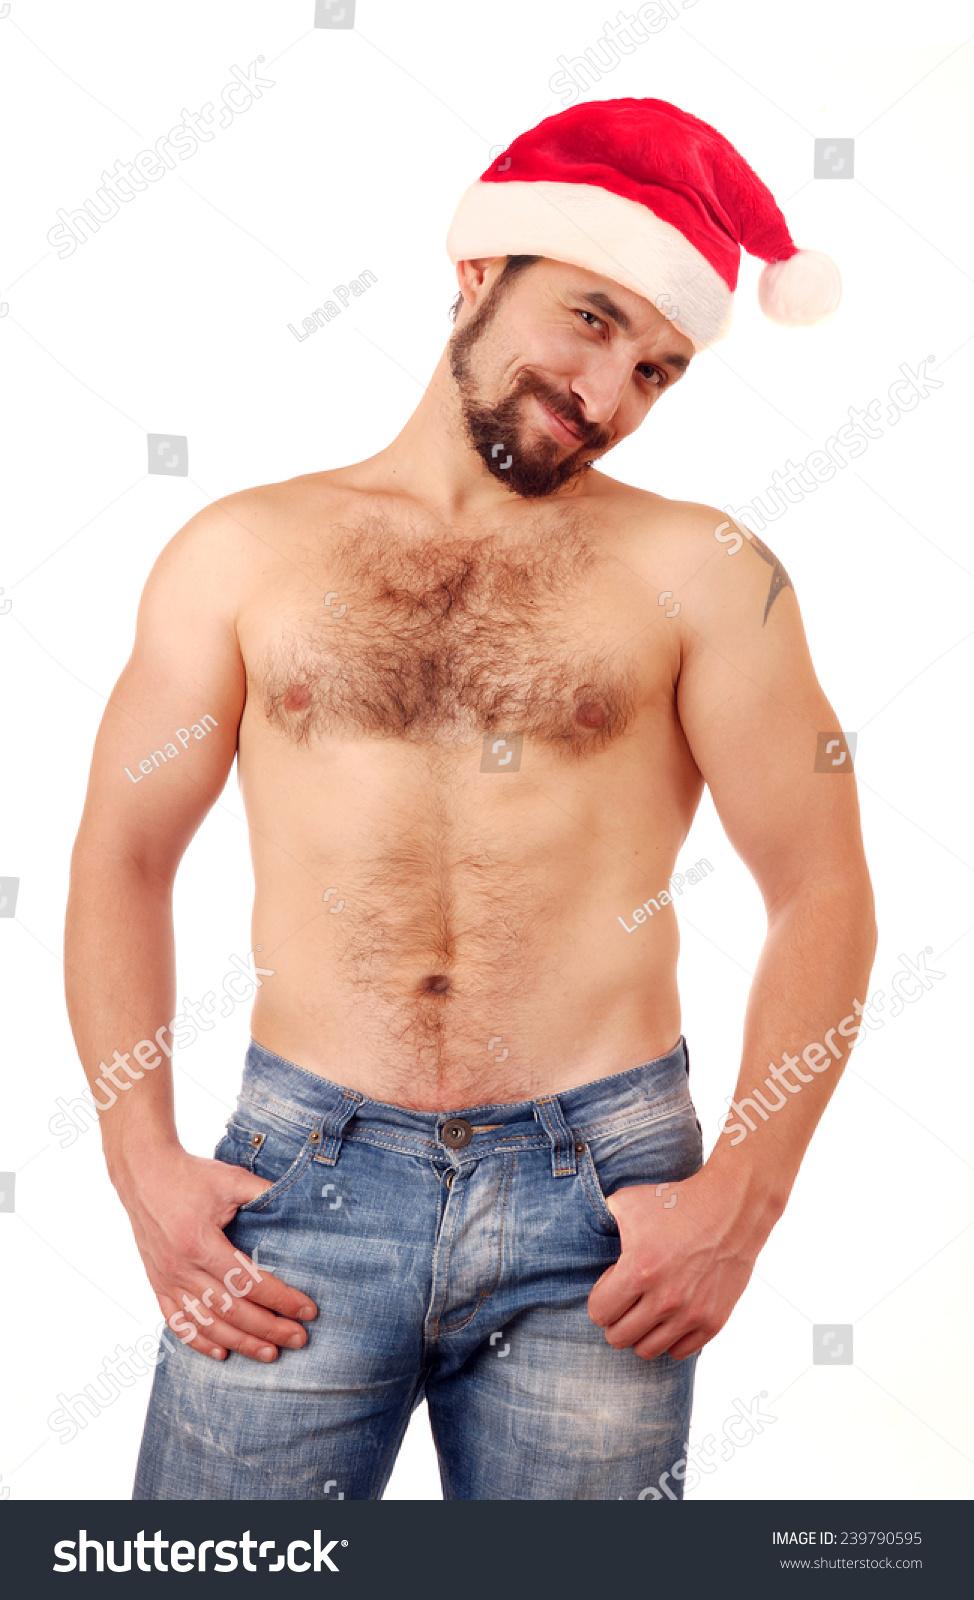 Automon man naked images 367